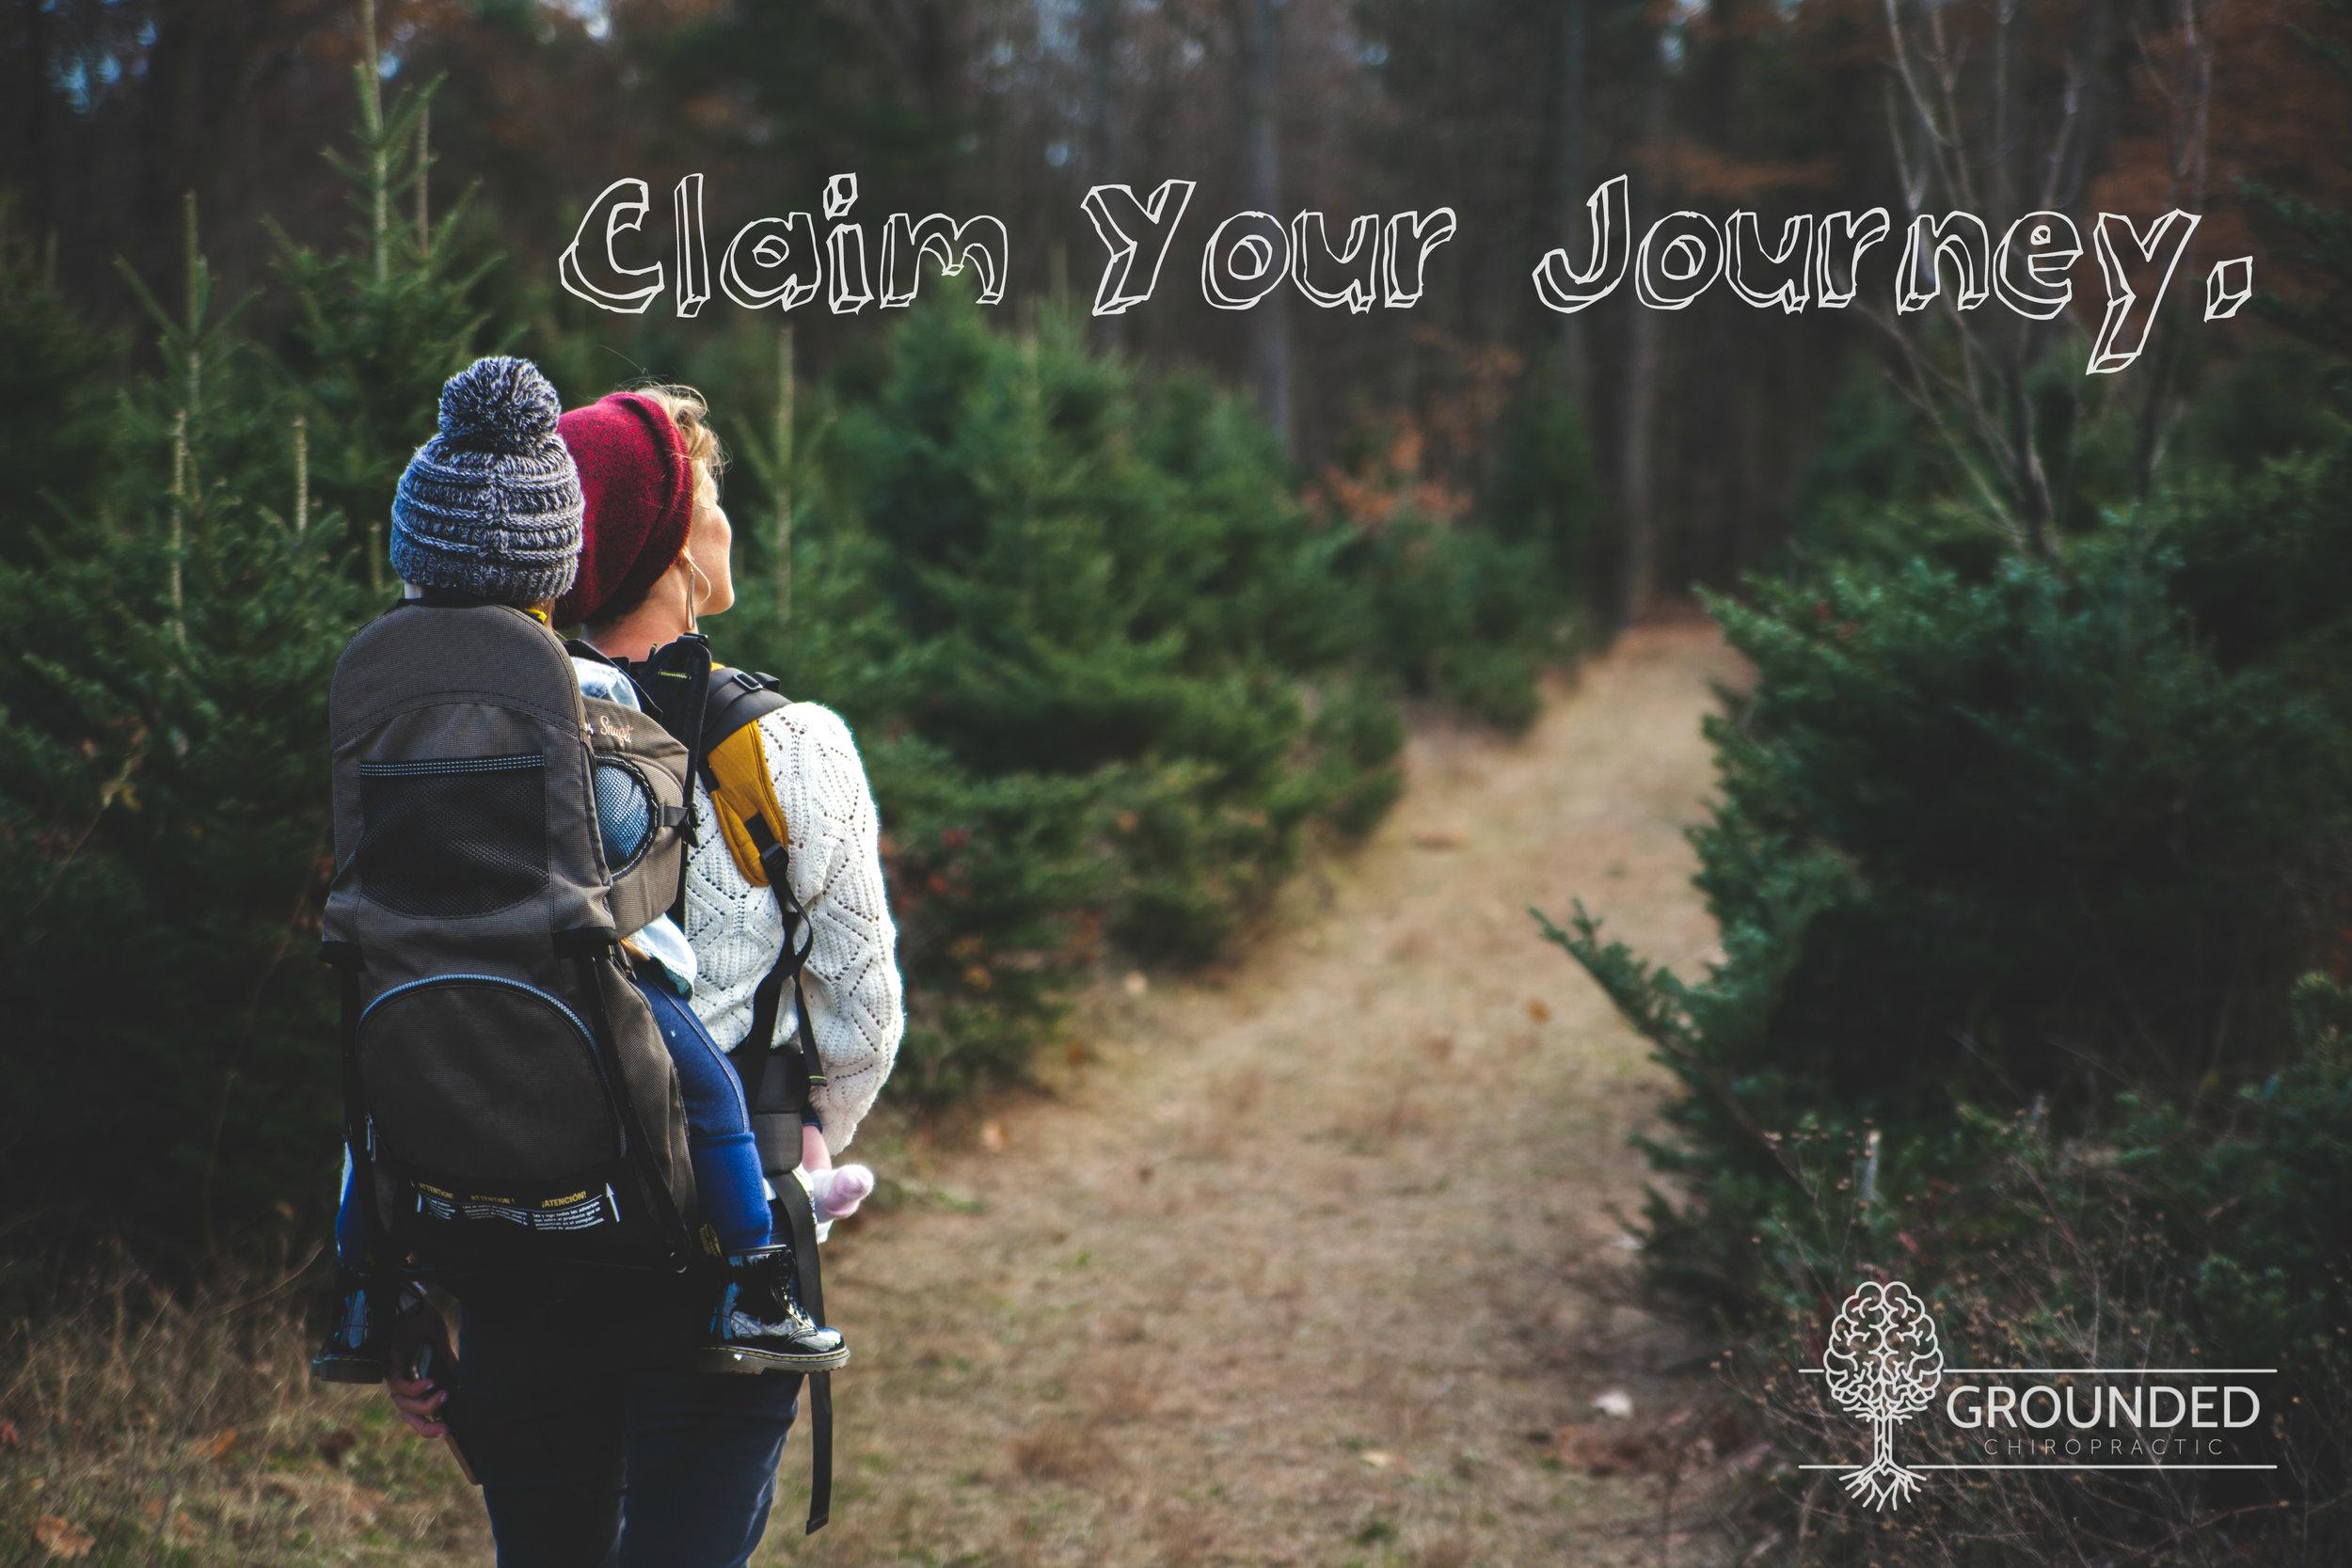 claim your journey.jpg